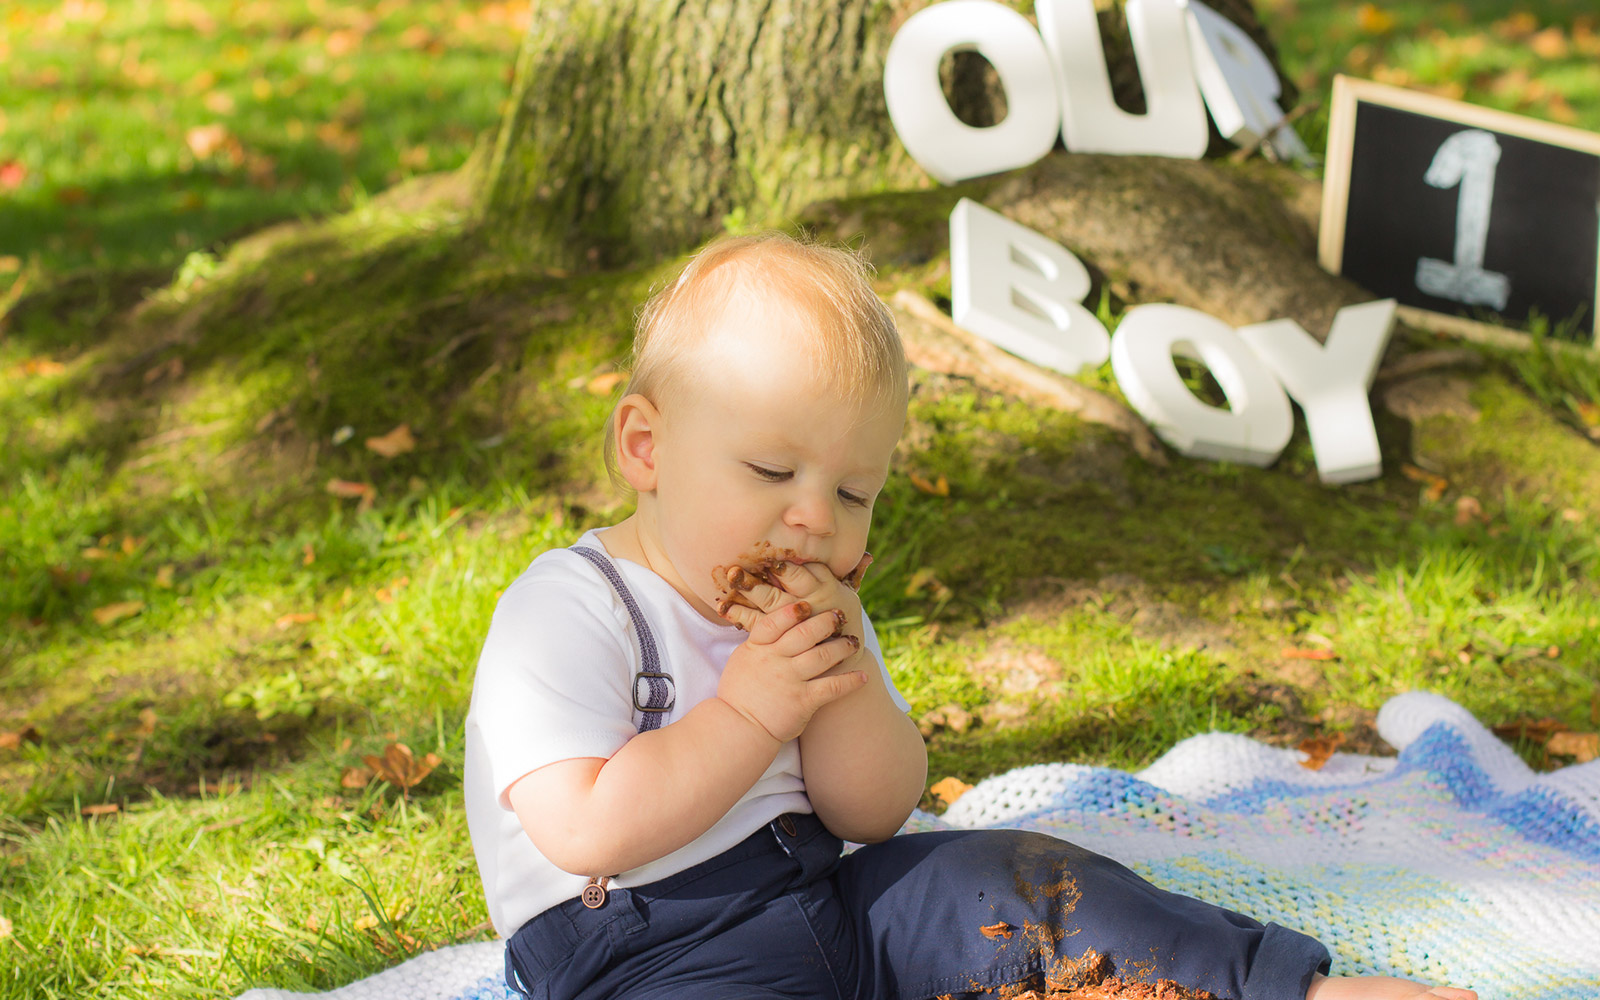 Mel Hudson Cake Smash Photographer Shaftesbury Park Carrickfergus, Outdoor Cake Smash